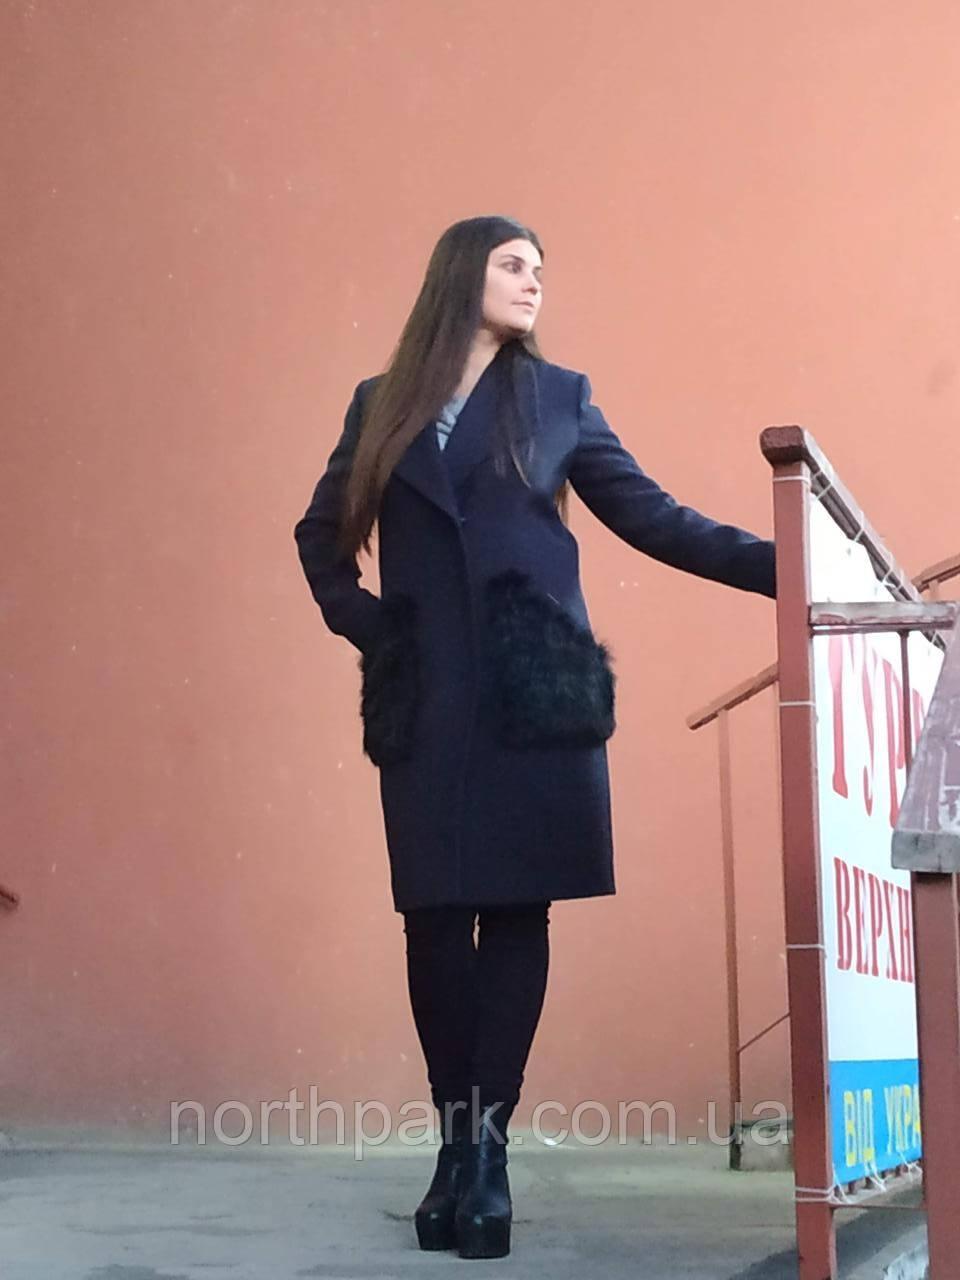 Модне тепле кашемірове пальто з хутряними кишенями, синє